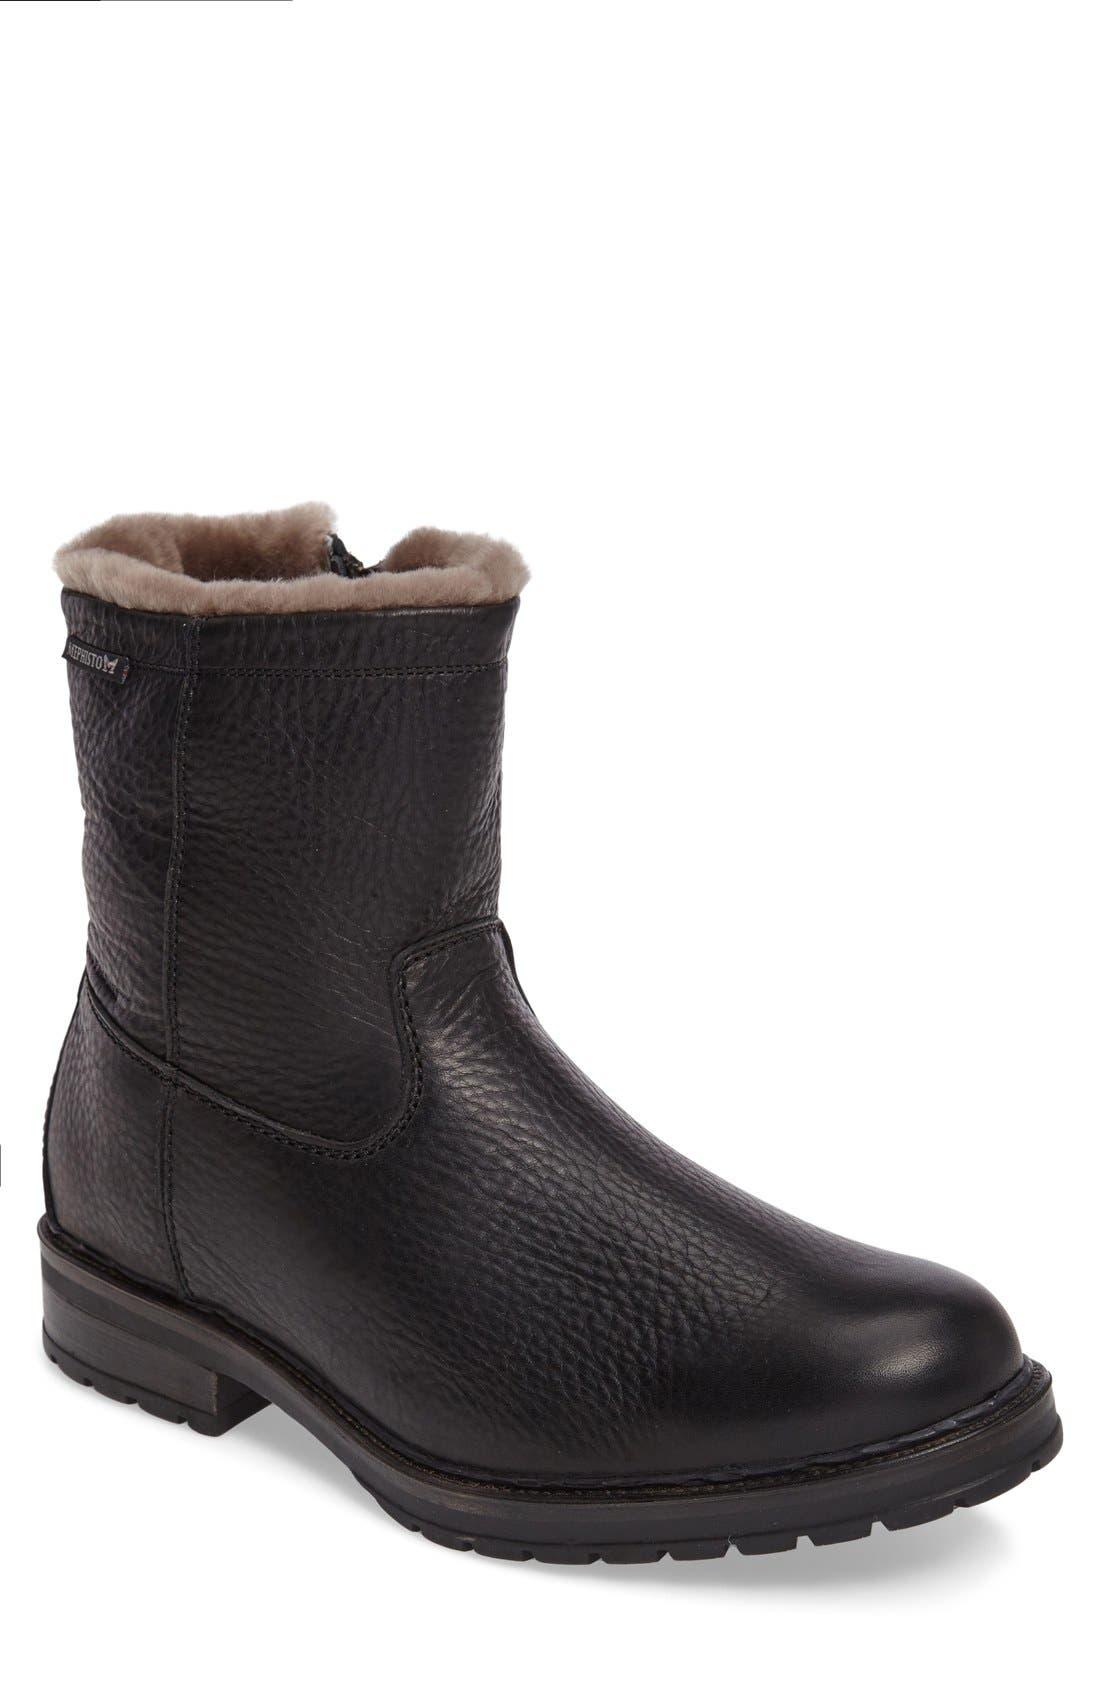 Leonardo Hydroprotect Waterproof Genuine Shearling Lined Boot